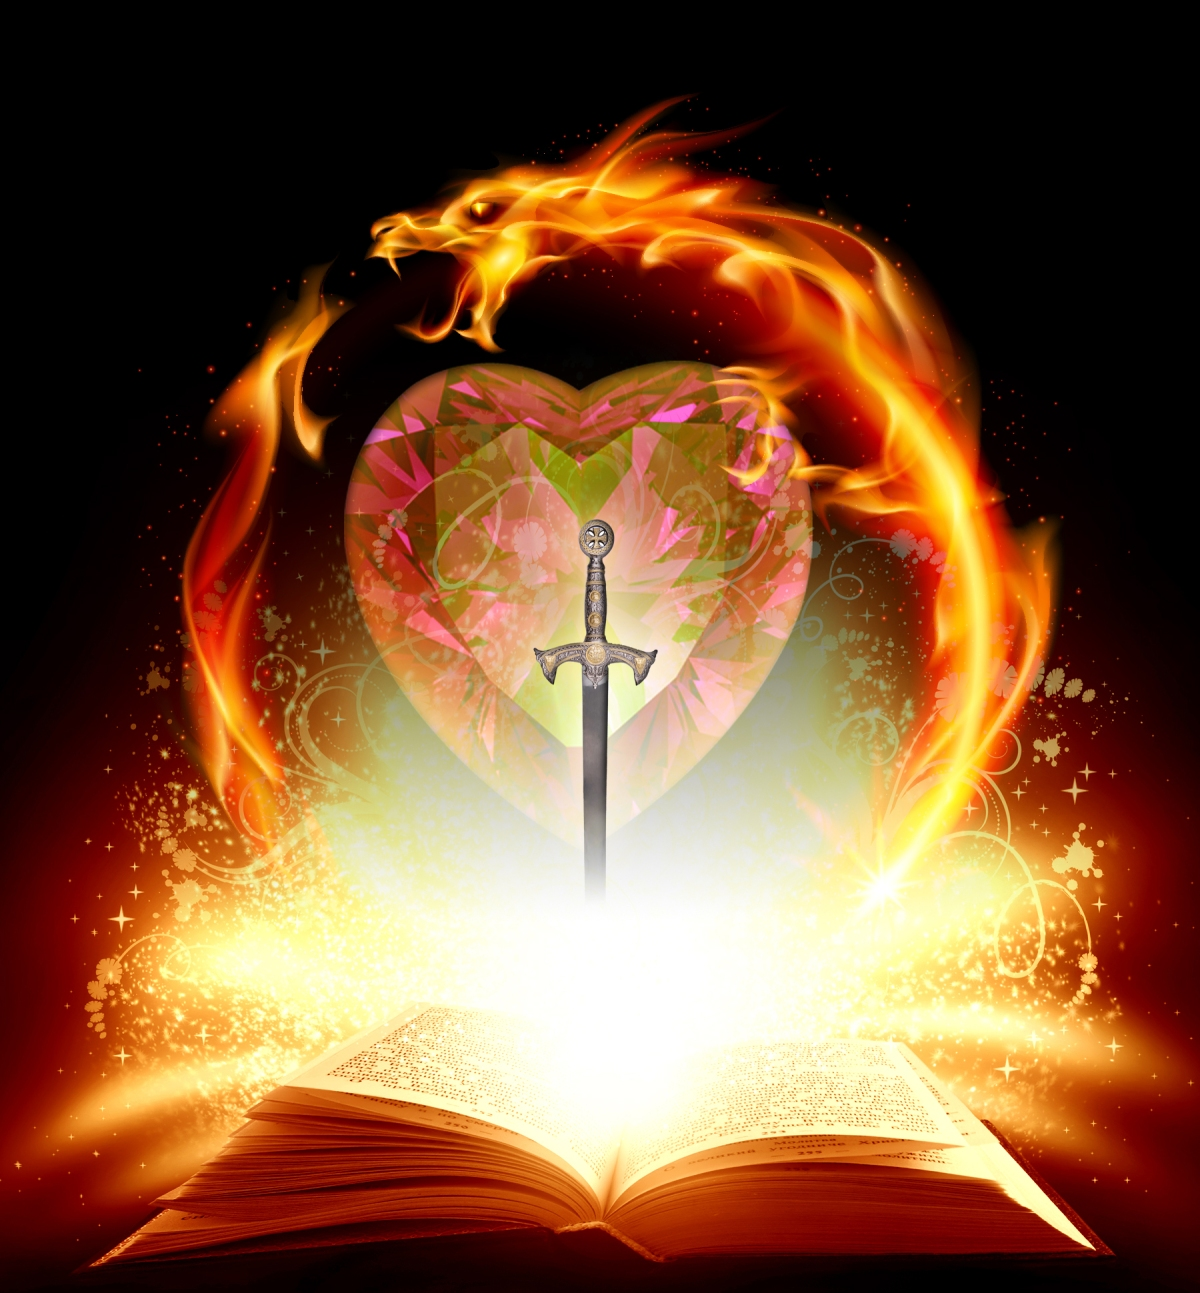 Chalvaren Rising, Paula Millhouse, fantasy, romance, fiction, magic, dragons, nobility, adventure quest, sword and sorcery, love